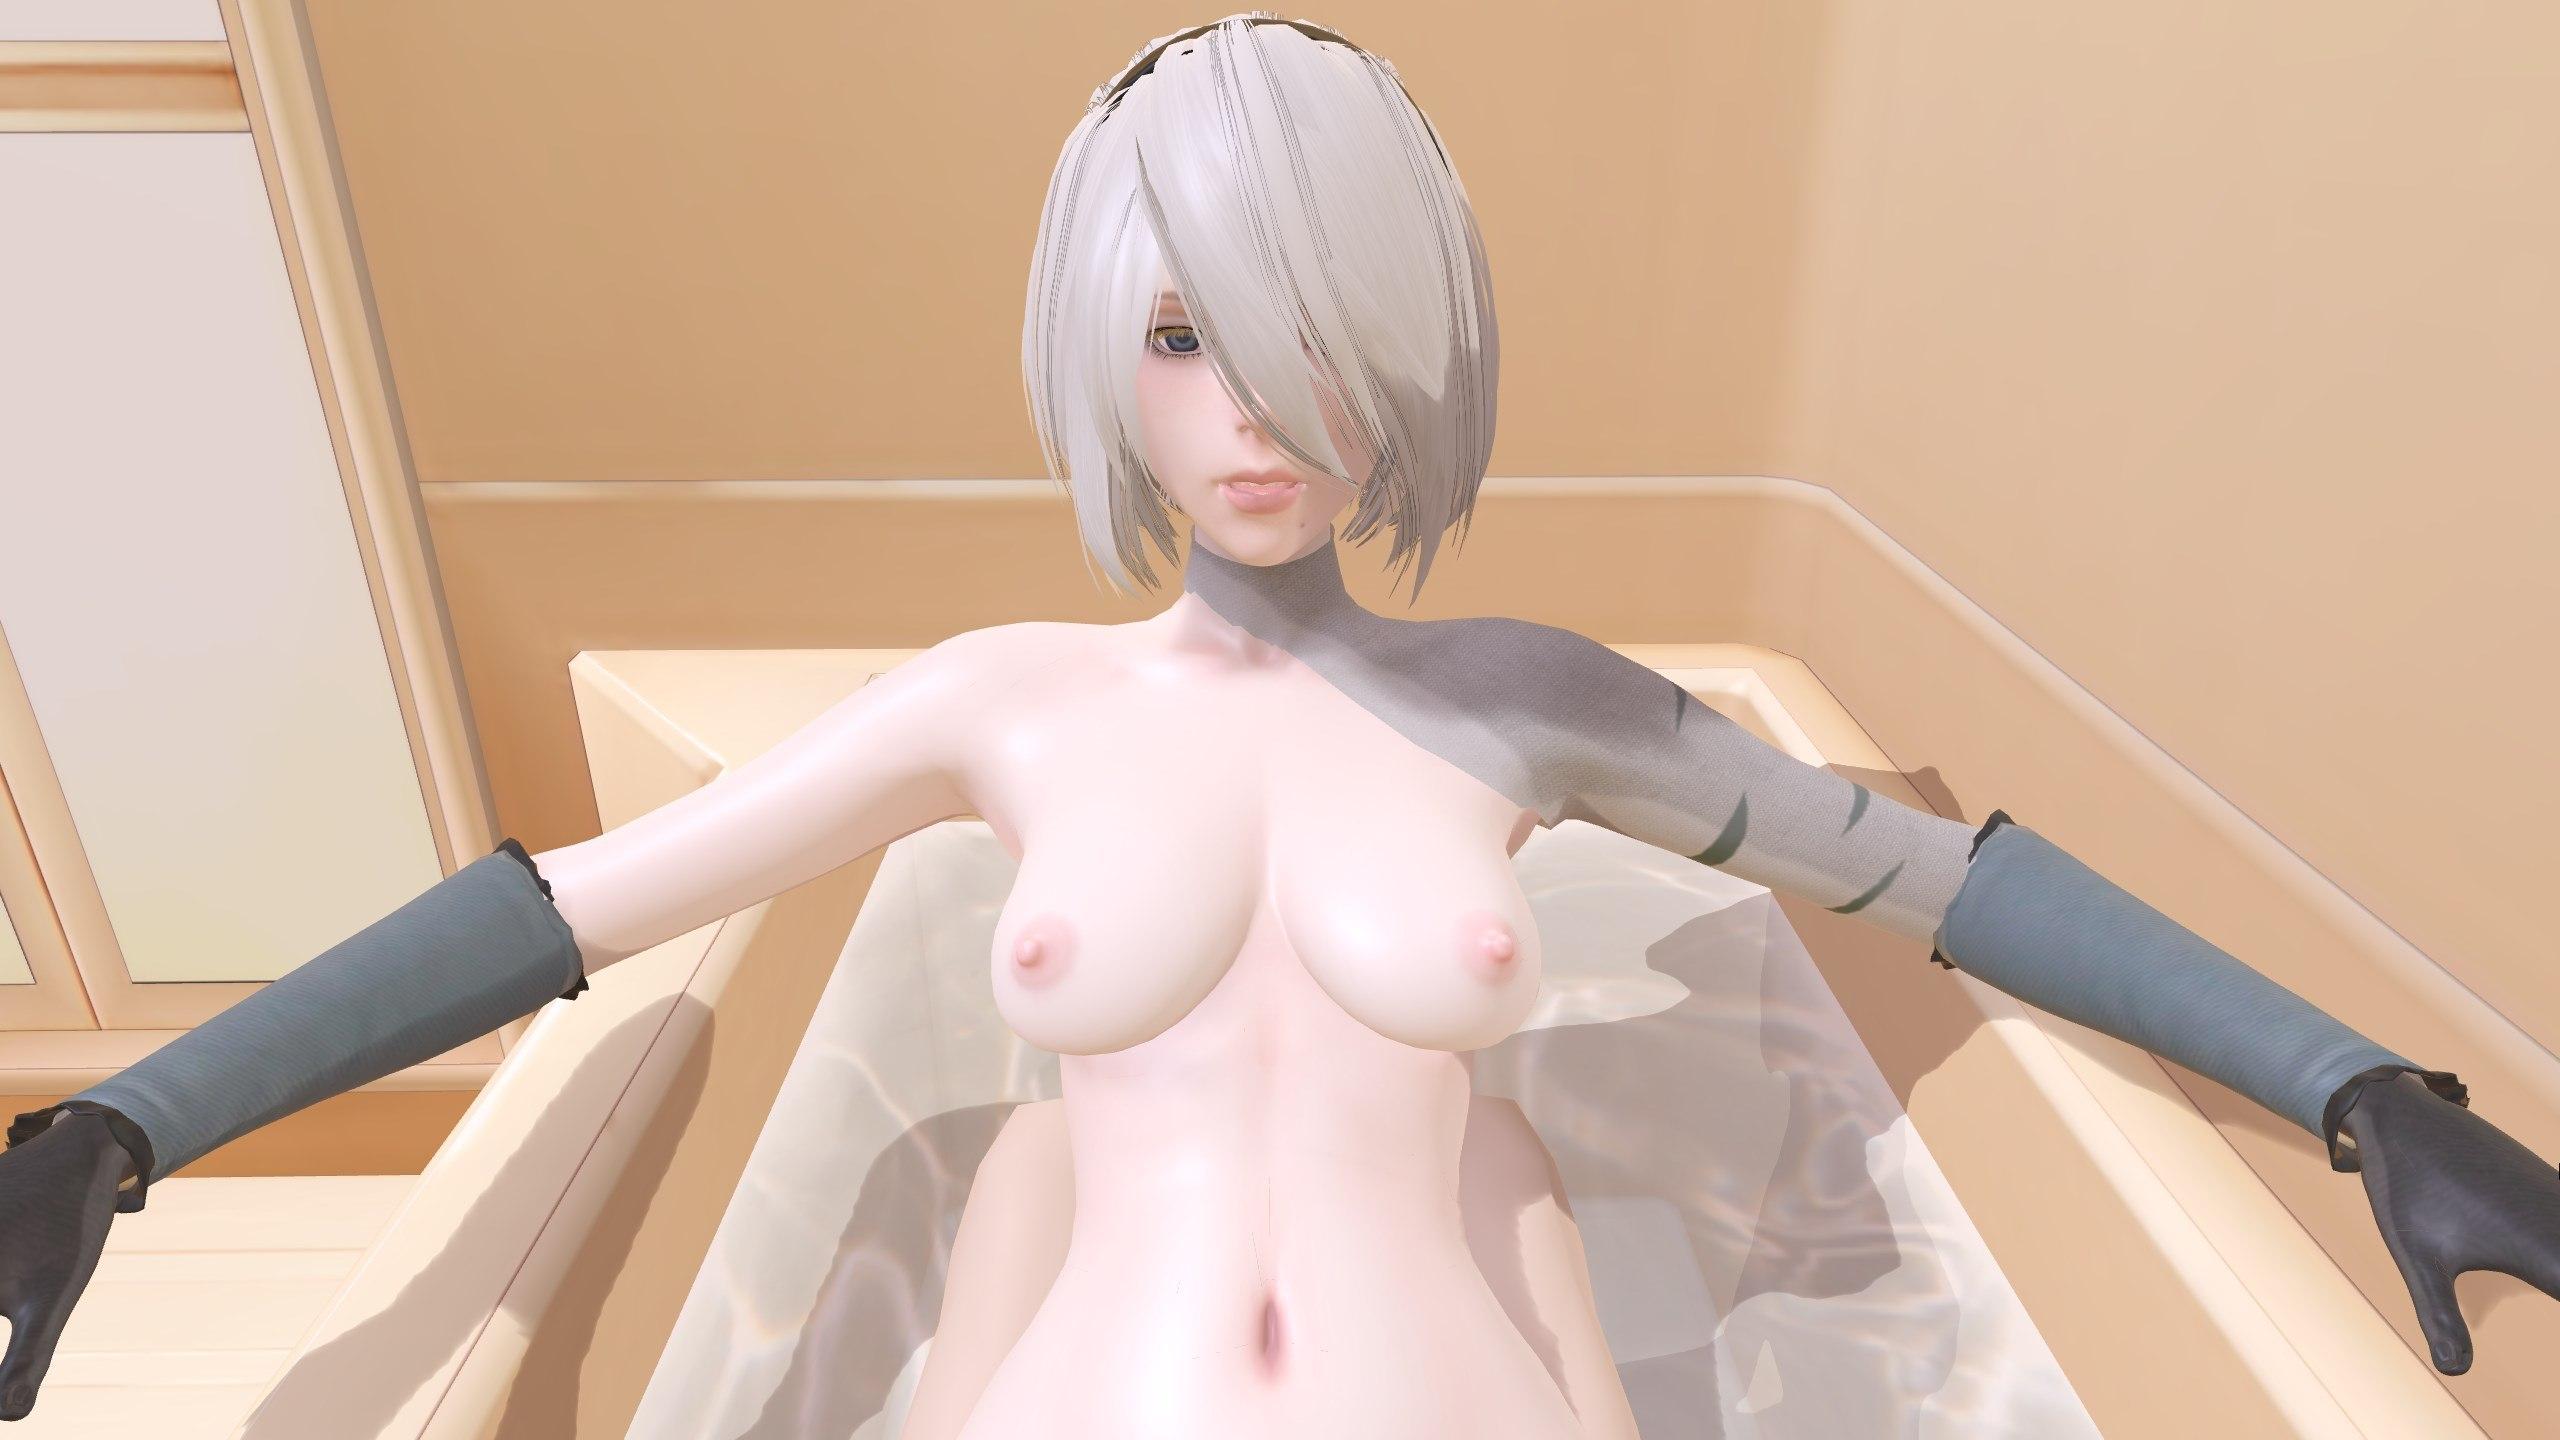 Waifu Sex Simulator Adult VR Games